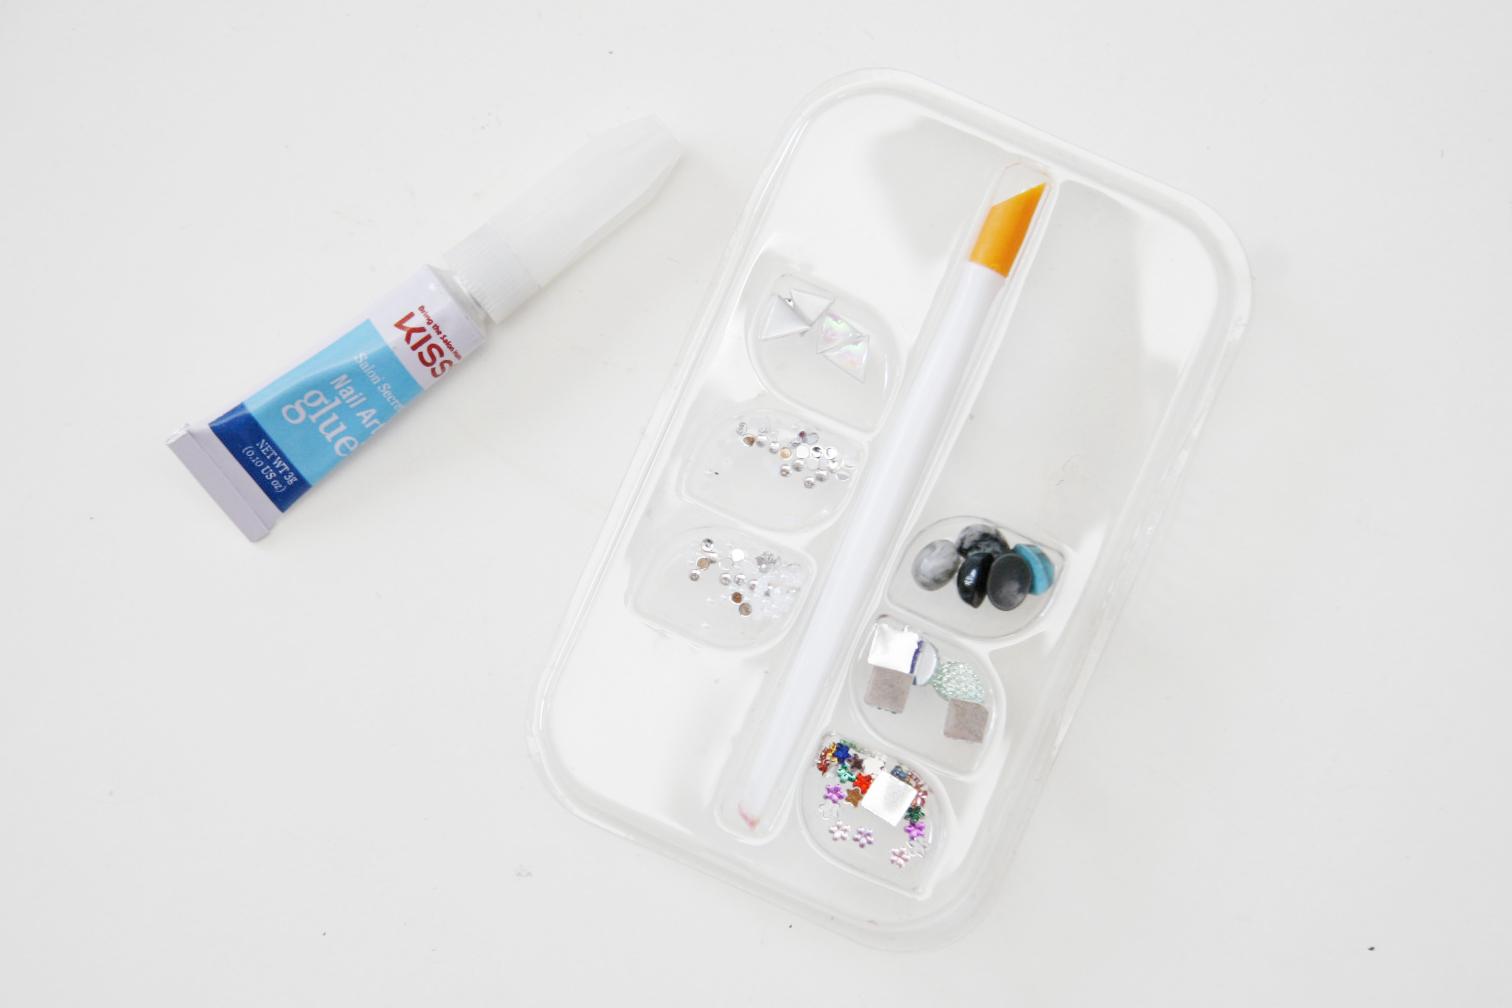 fun size beauty: KISS Salon Secrets Luxe Accents & Nail Art Glue